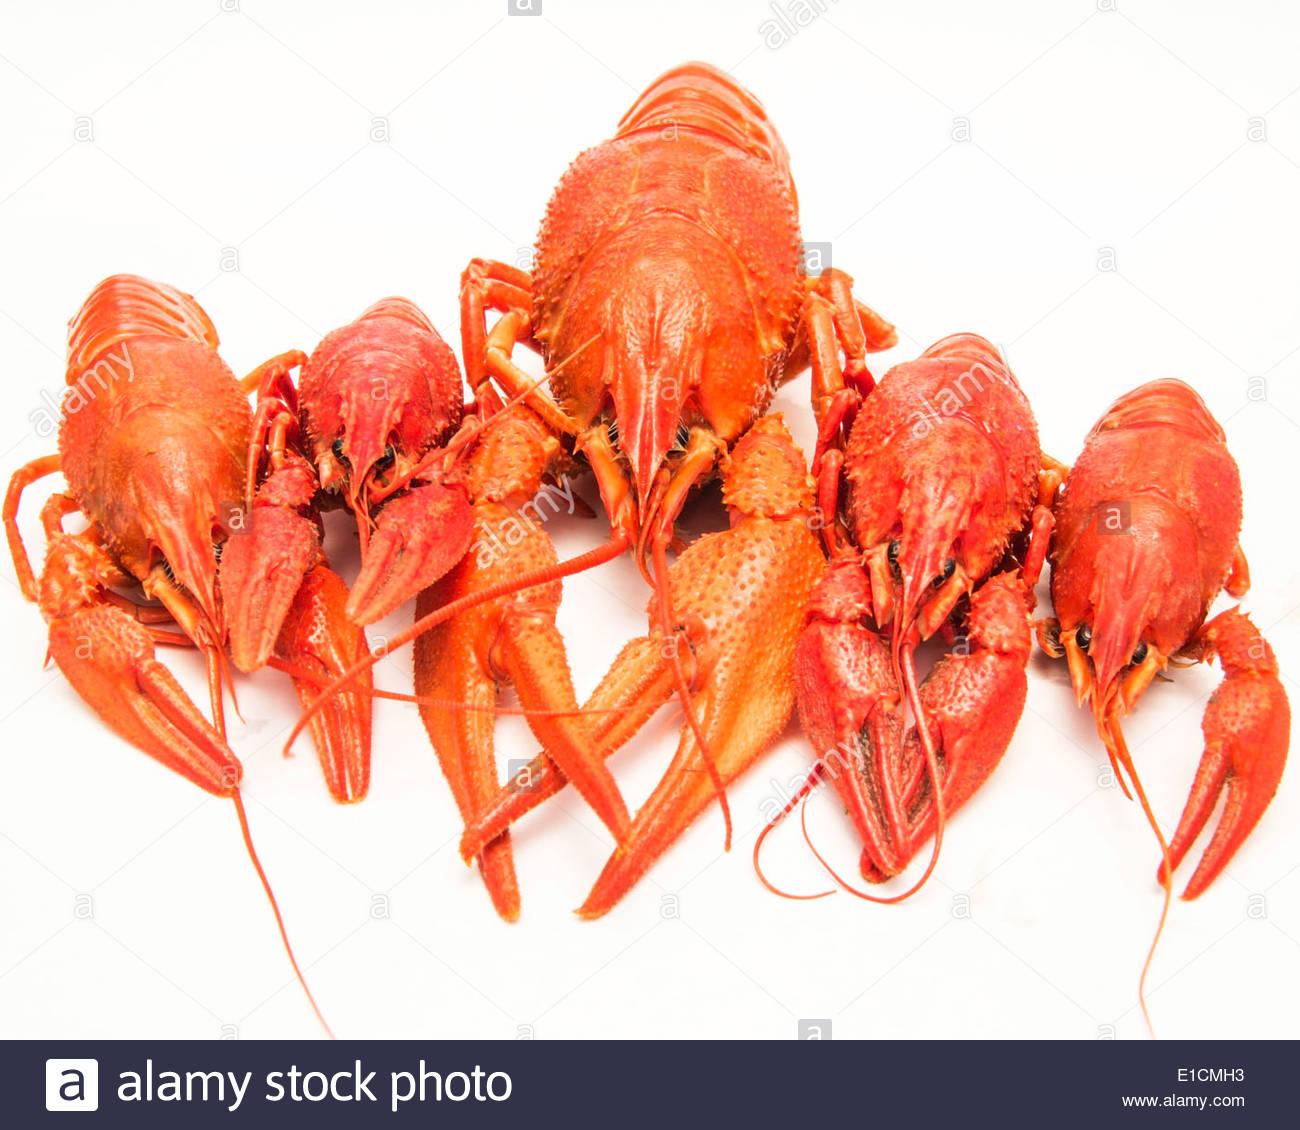 Boiled crawfish on a white background Stock Photo 69735711   Alamy 1300x1130